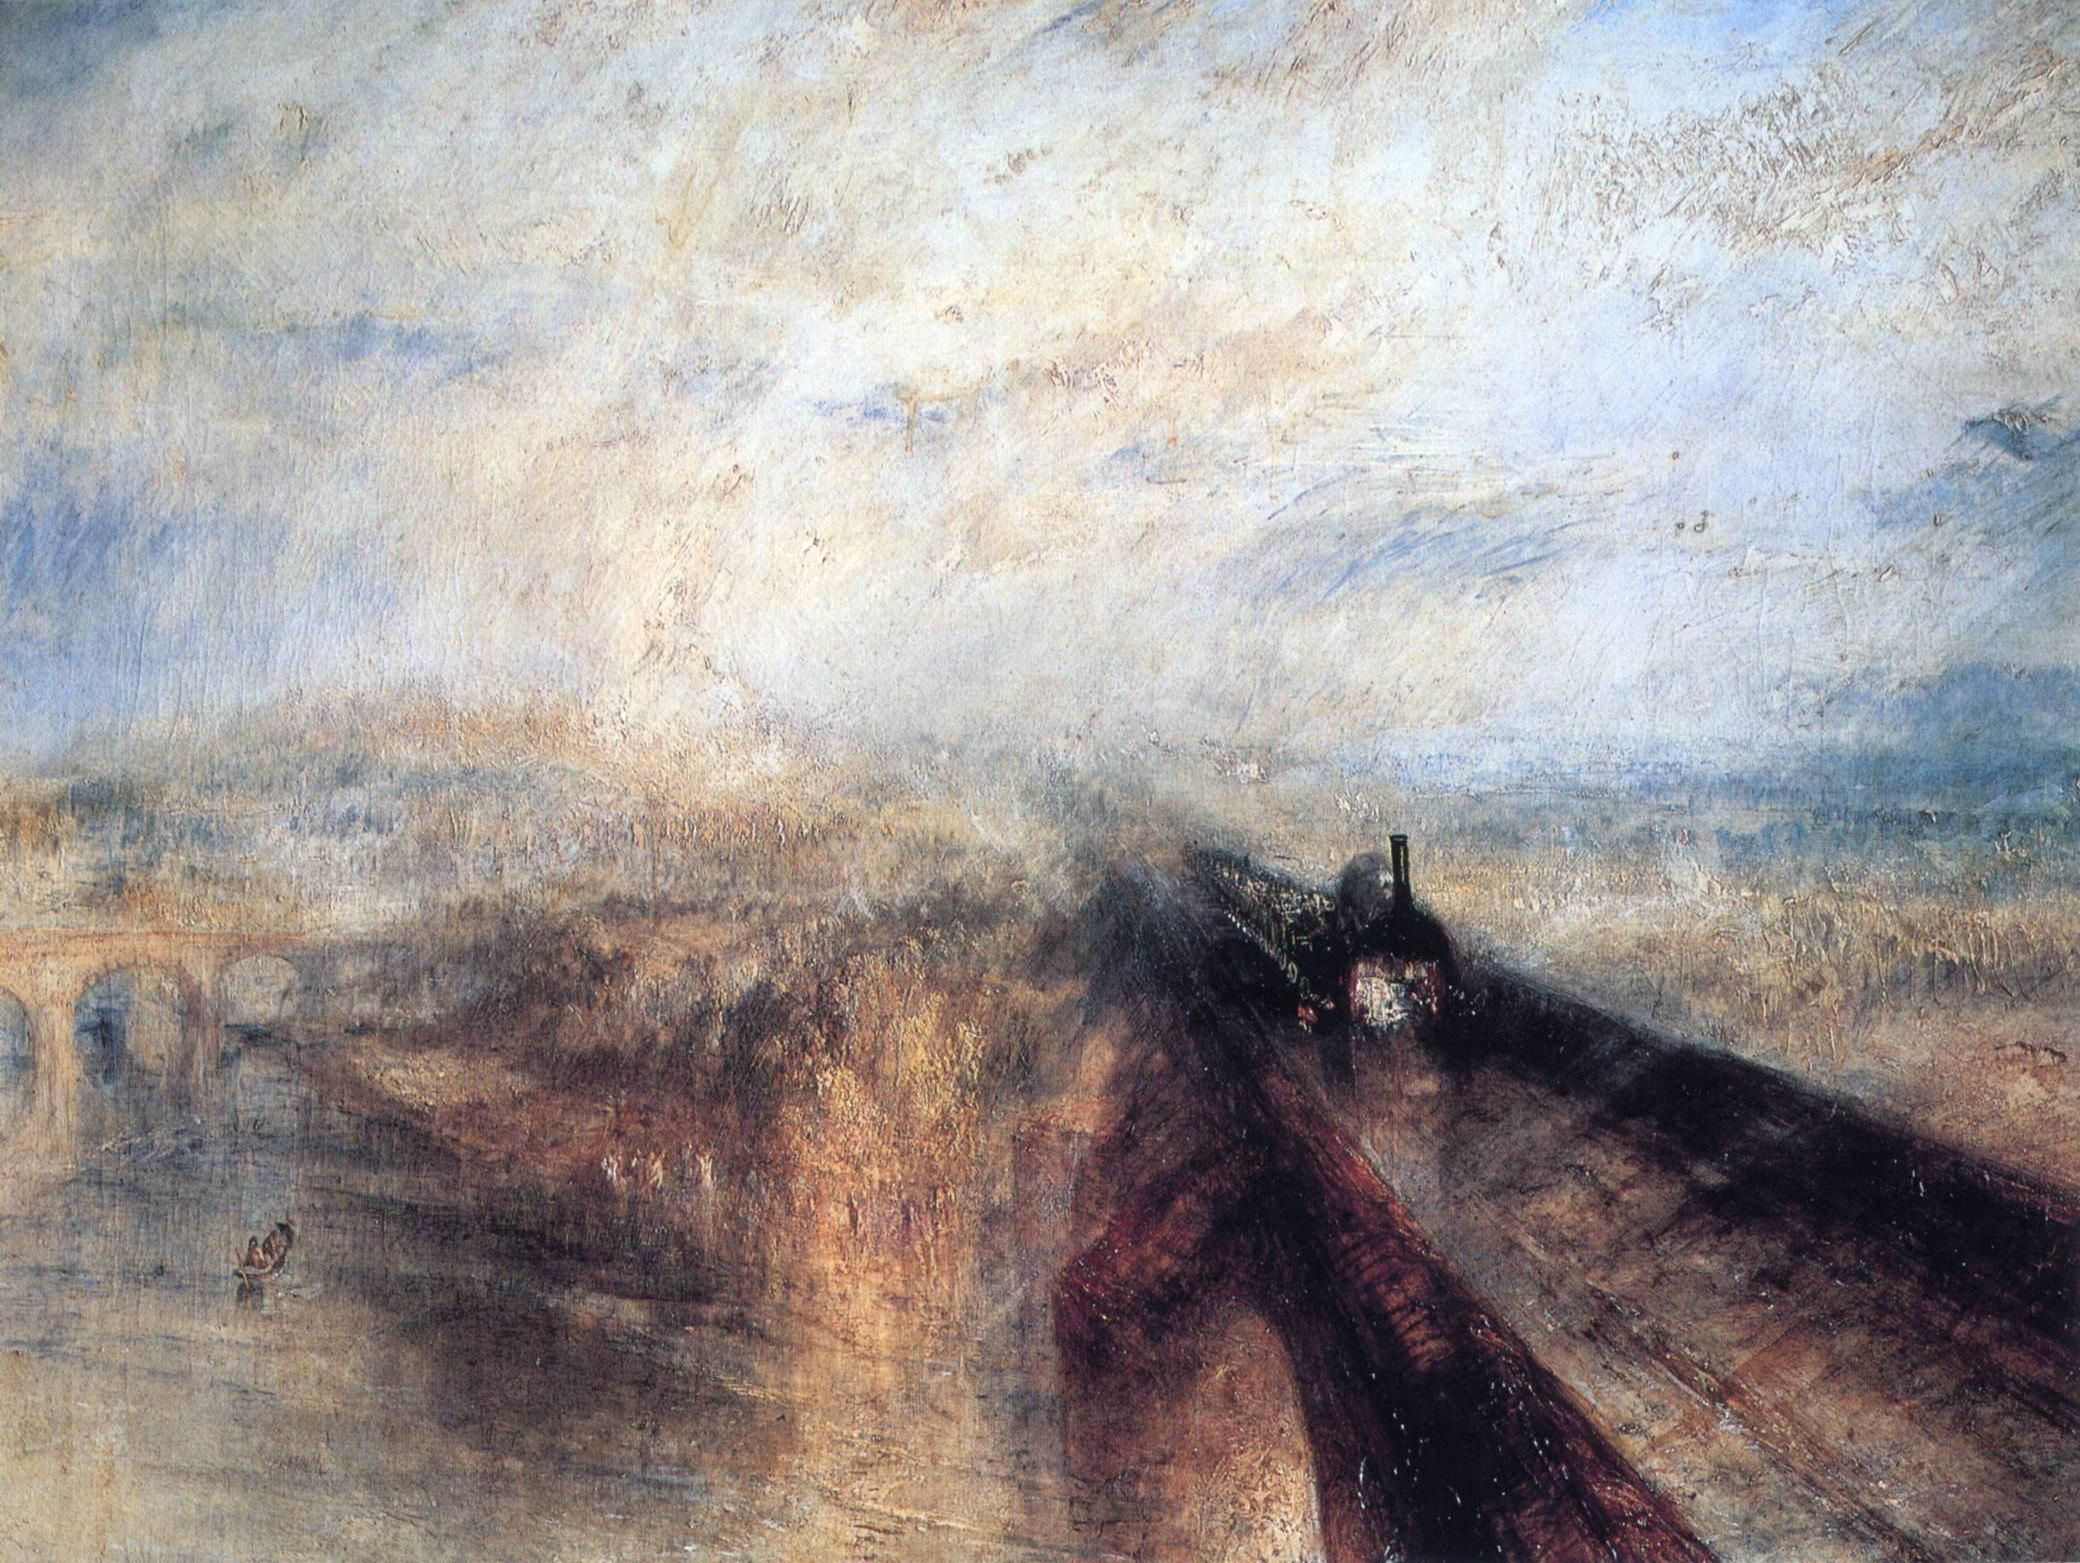 Rain, Steam and Speed, The Great Western Railway, Joseph Mallord William Turner 1844